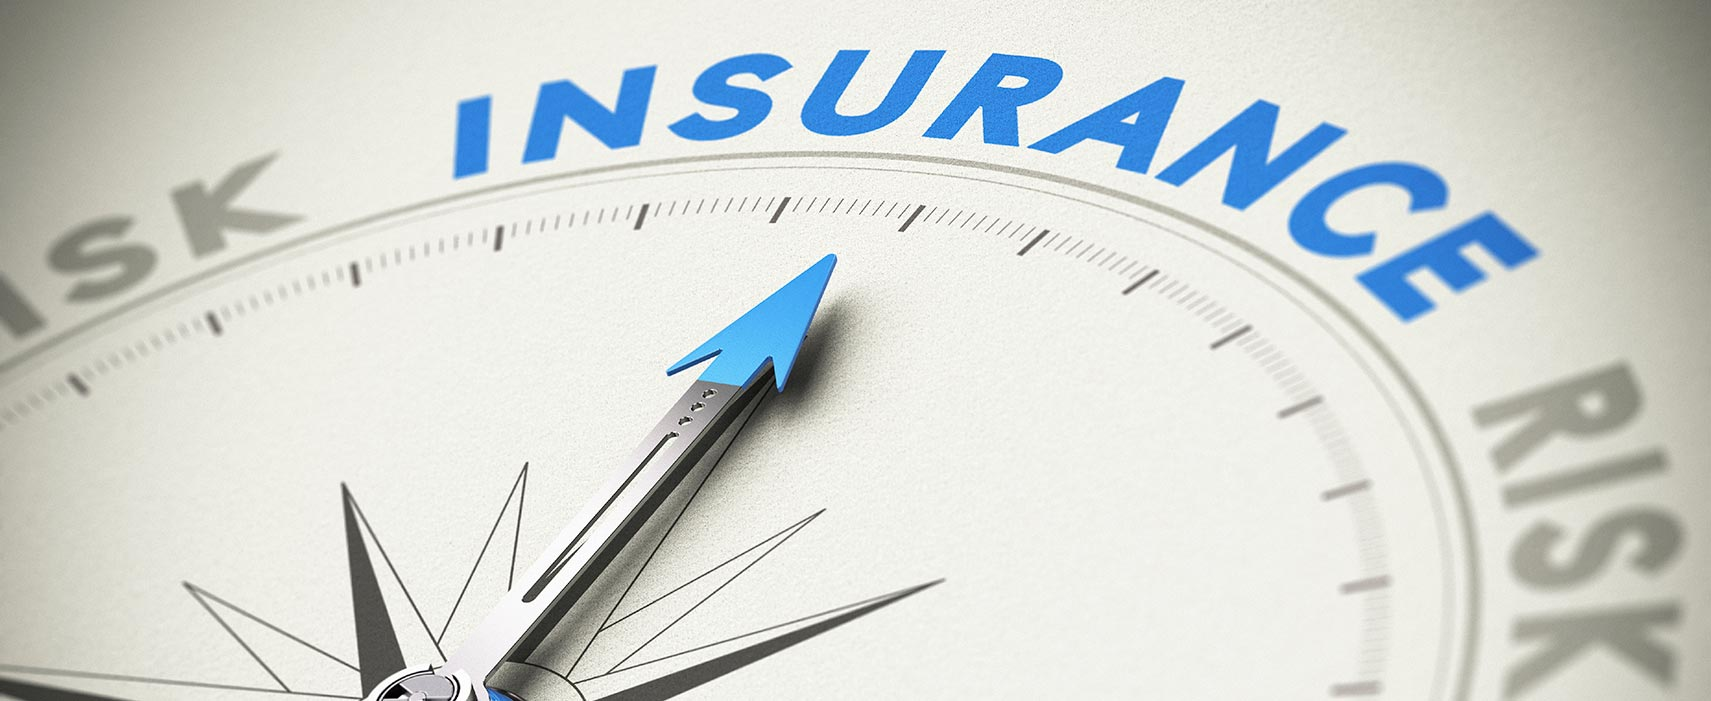 Supplemental Insurance